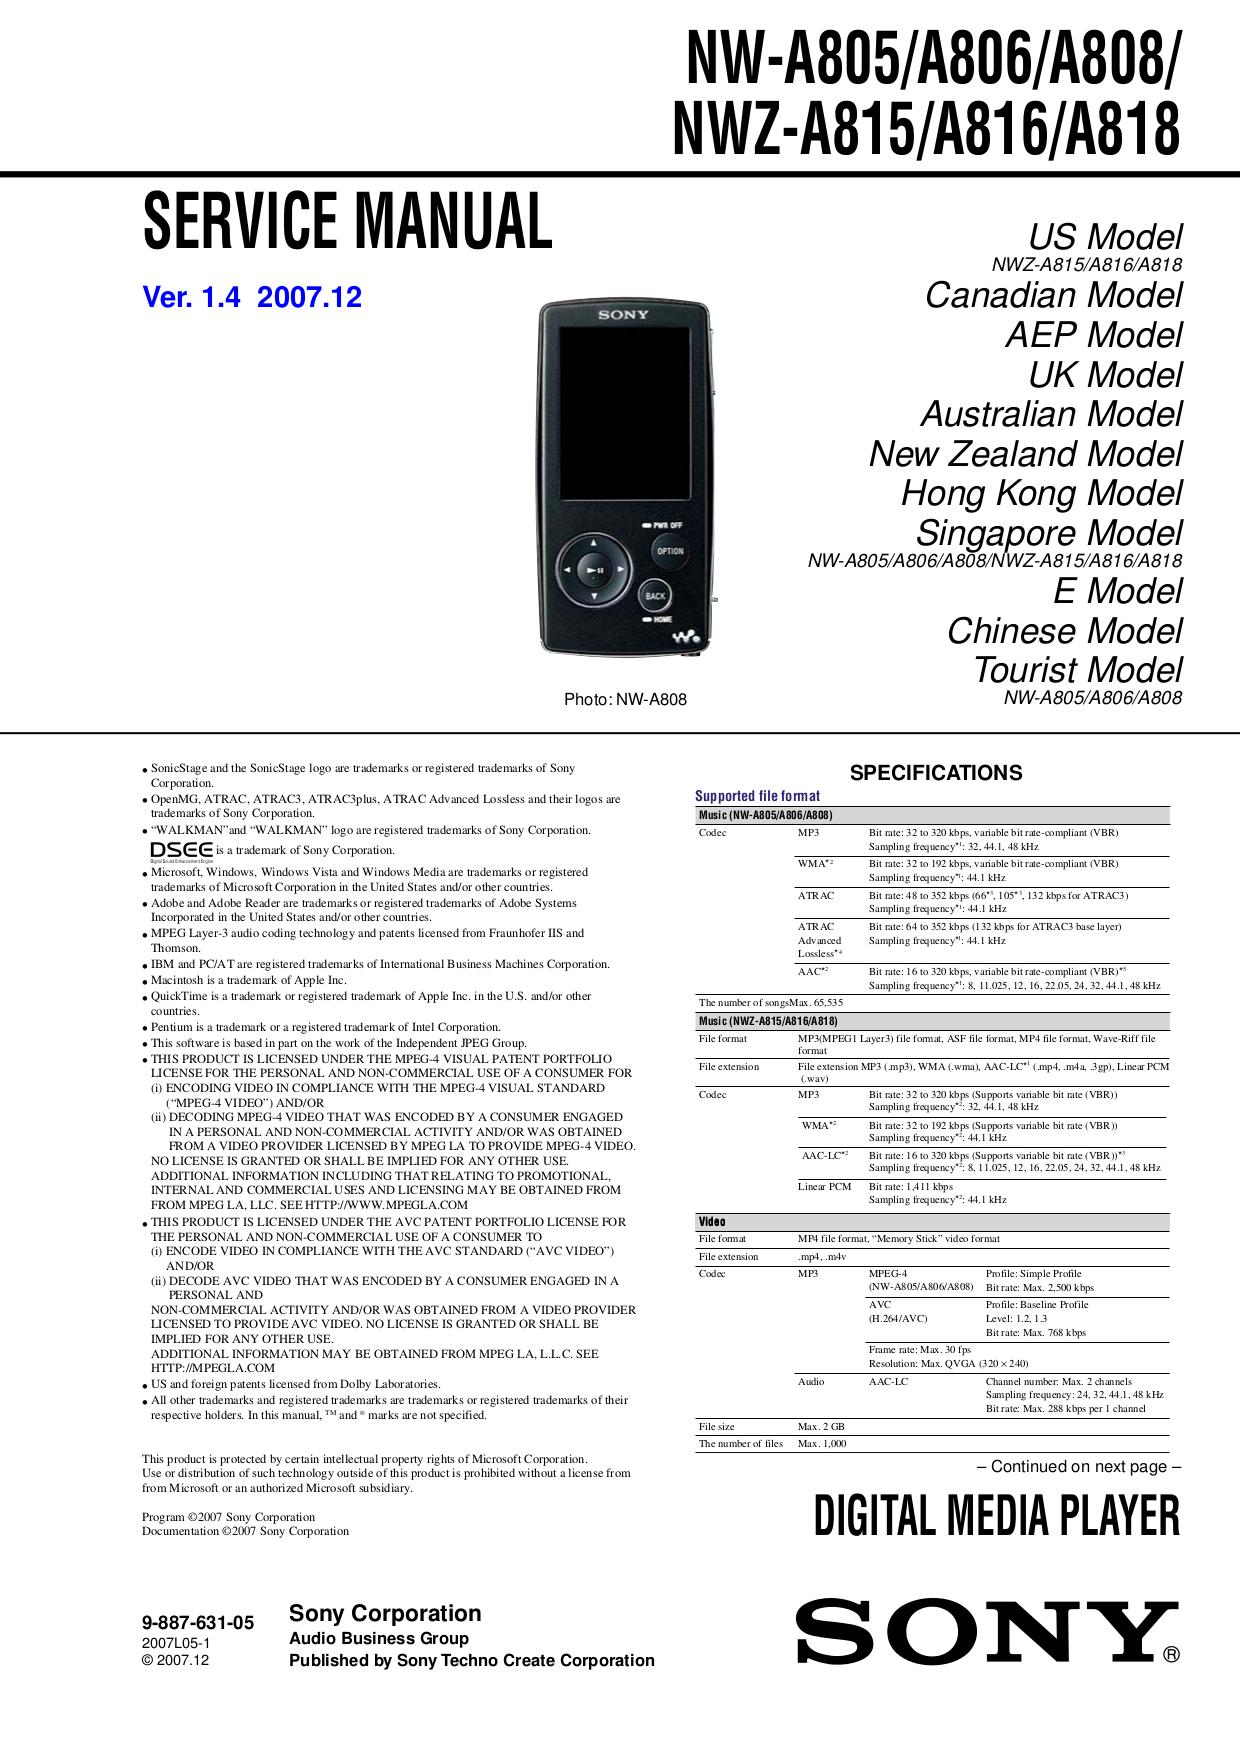 download free pdf for sony walkman nw e3 mp3 player manual rh umlib com Atrac Tape Atrac -Tain